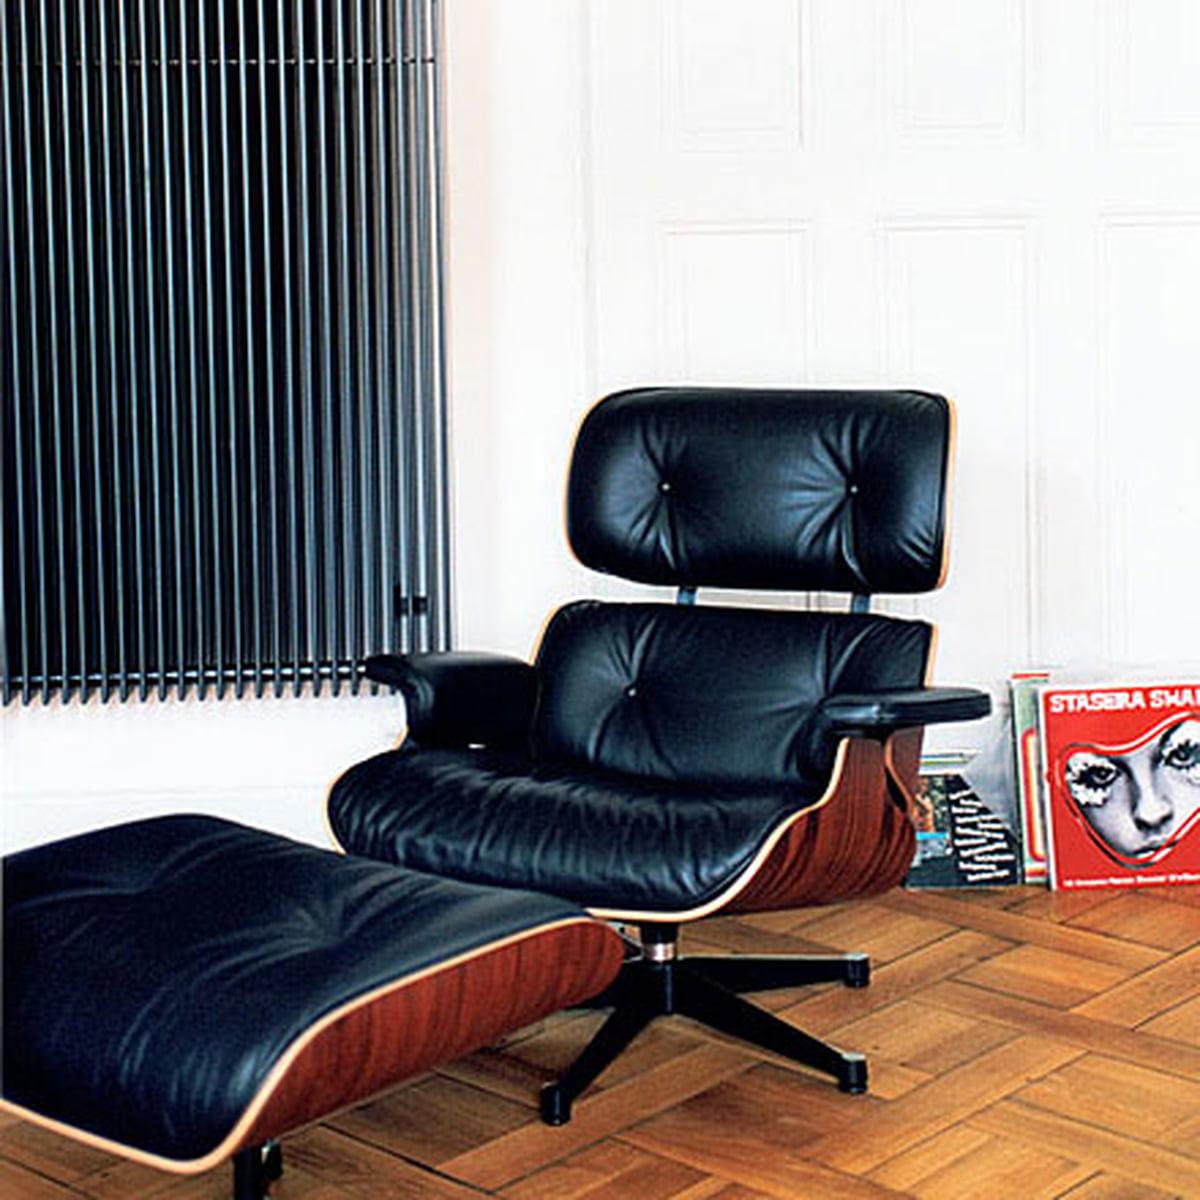 Vitra lounge chair amp ottoman white version von charles amp ray eames - Vitra Lounge Chair Amp Ottoman White Version Von Charles Amp Ray Eames Lounge Chair Ottoman Download